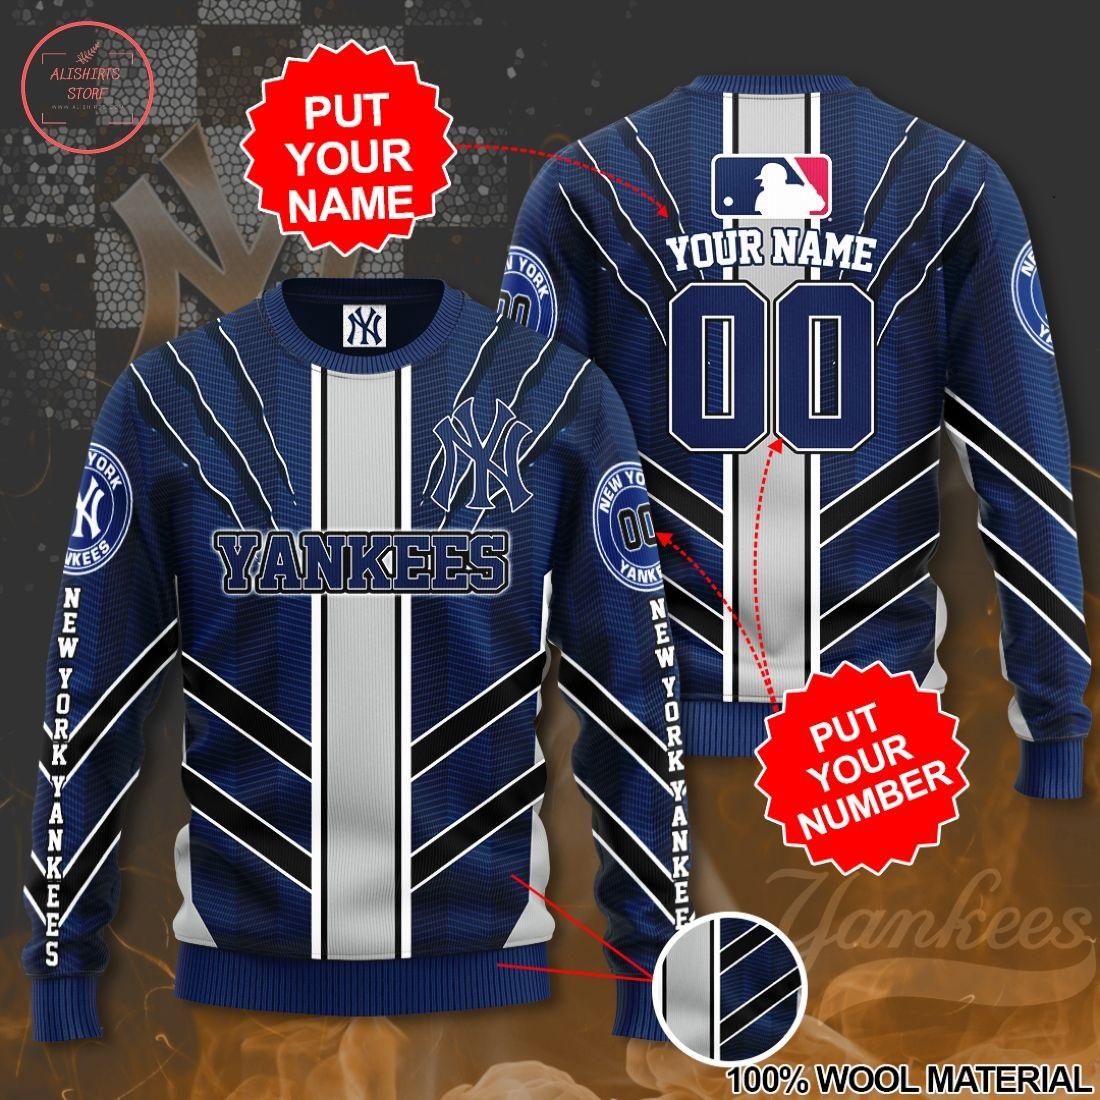 MLB New York Yankees Personalized 3D Sweatshirt